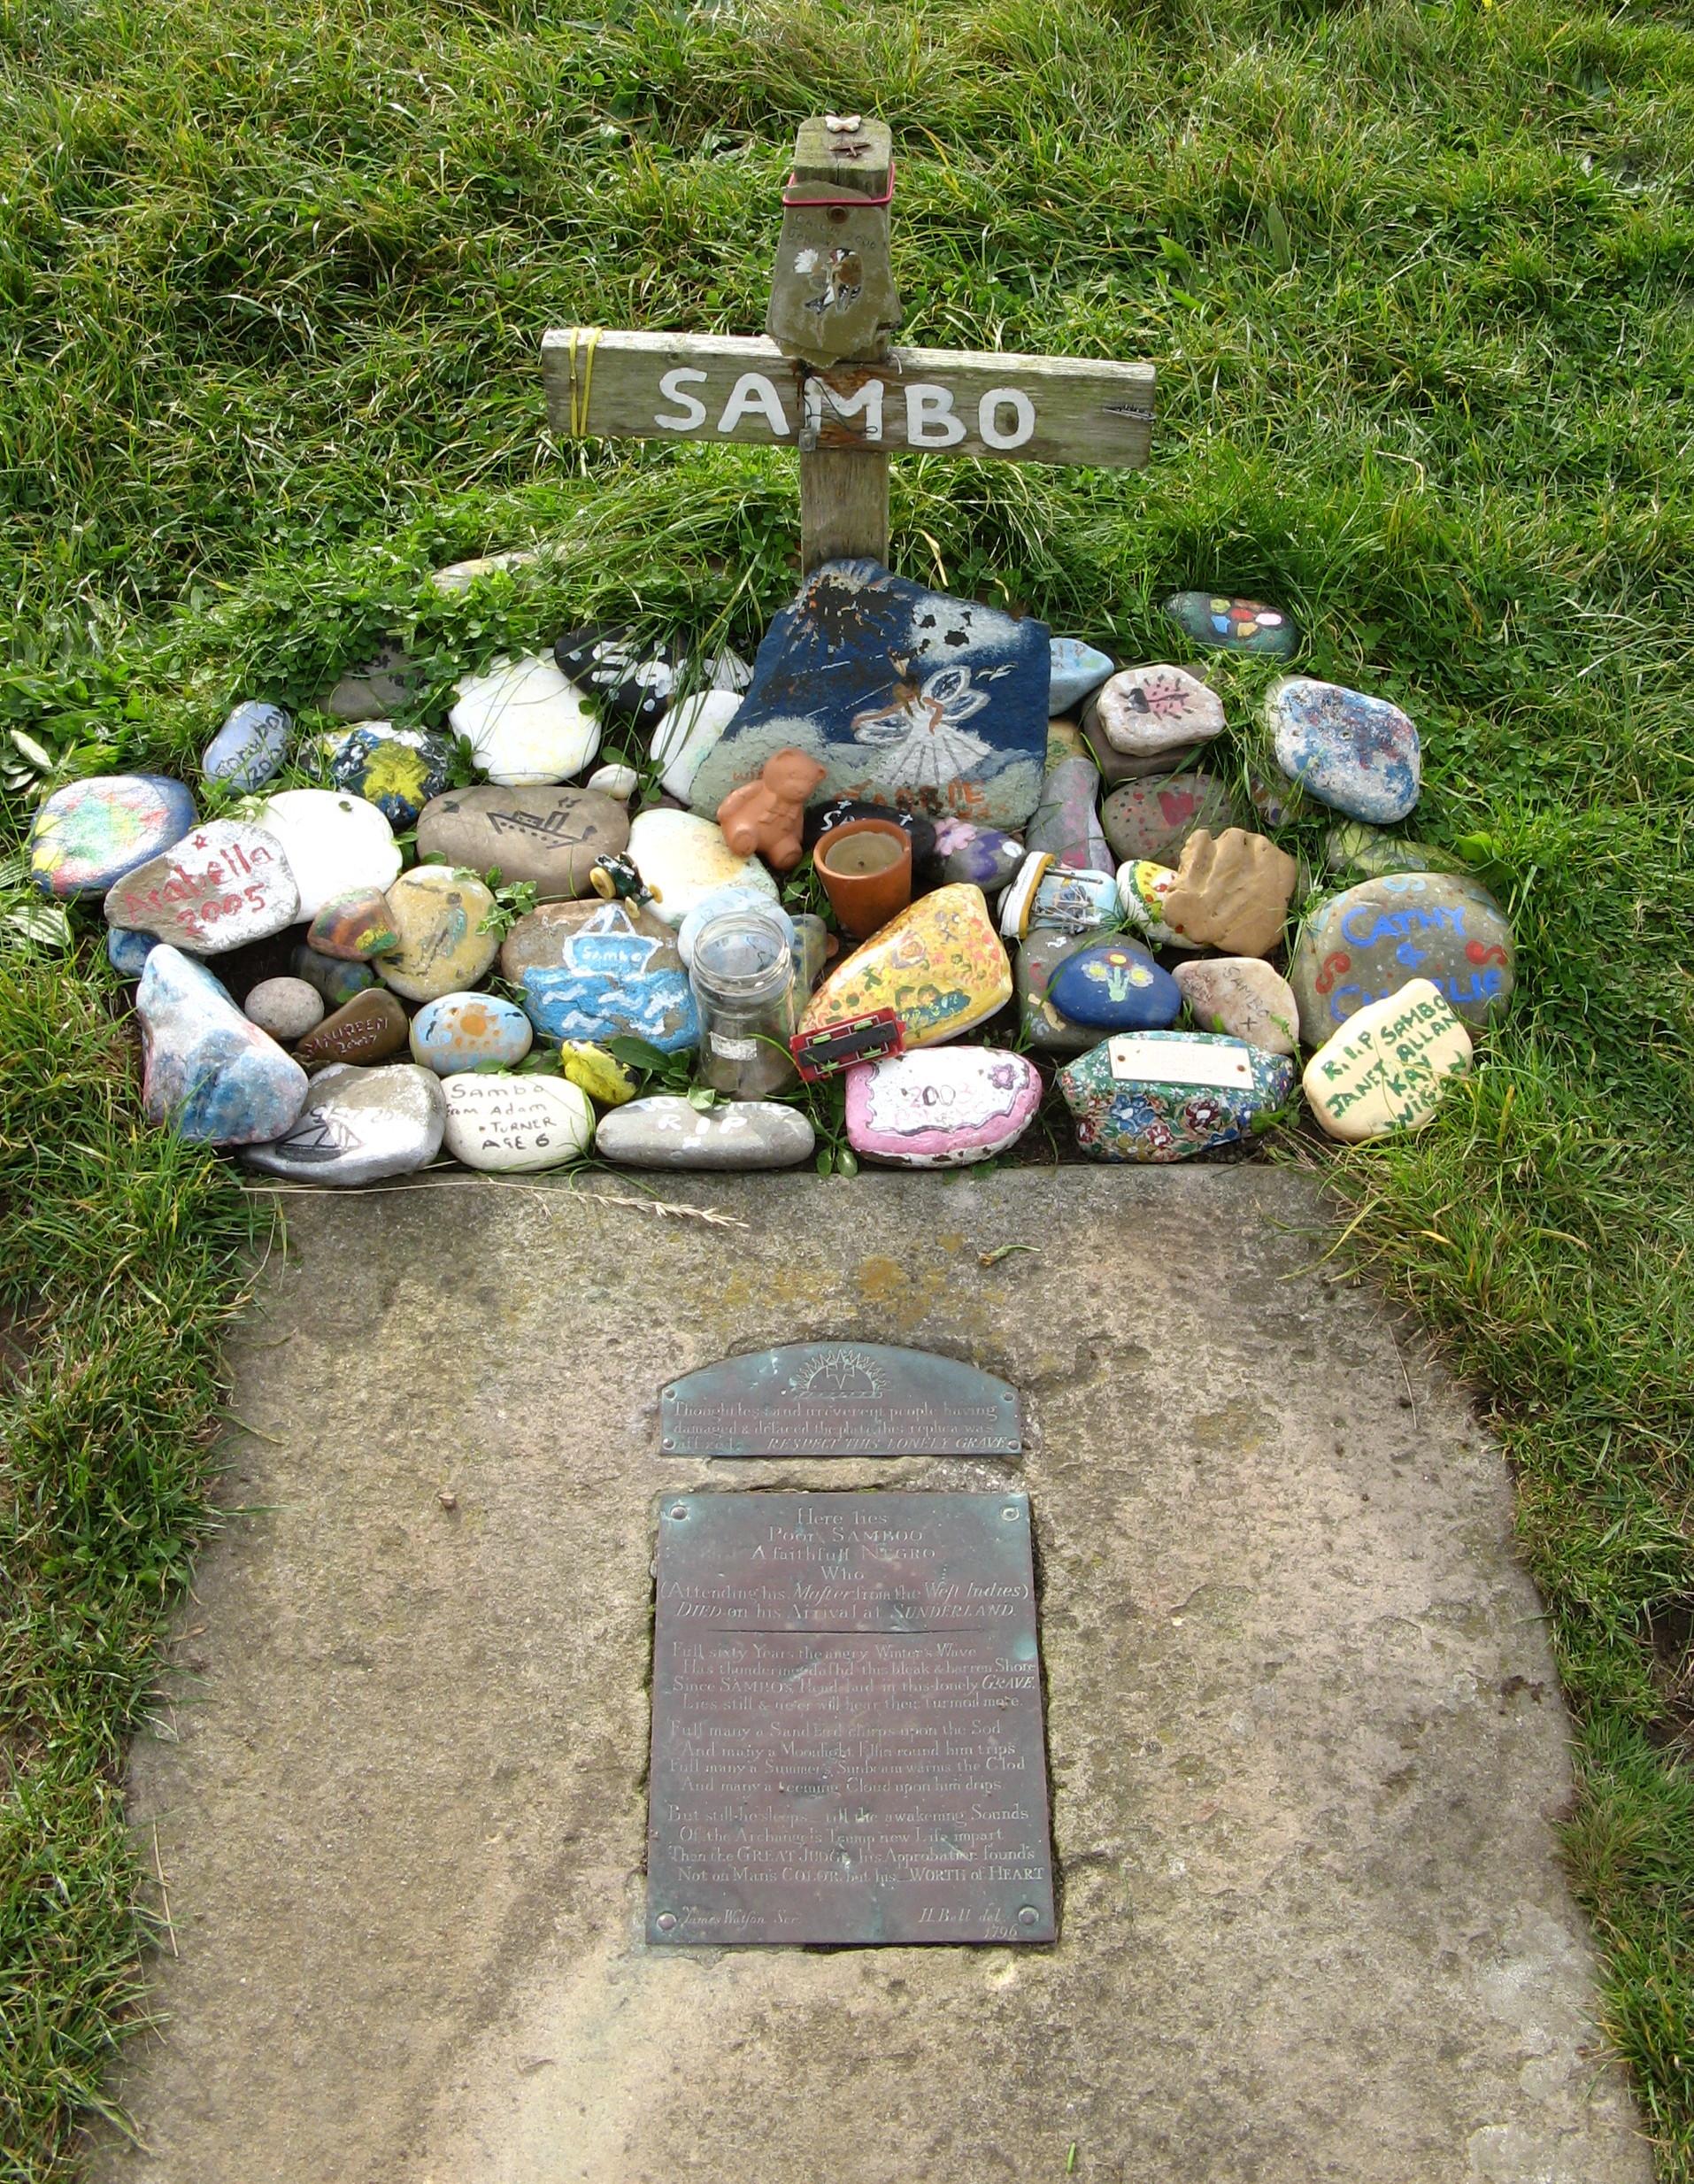 image of Sambo's grave from https://upload.wikimedia.org/wikipedia/commons/5/52/Sambo%27s_Grave.jpg